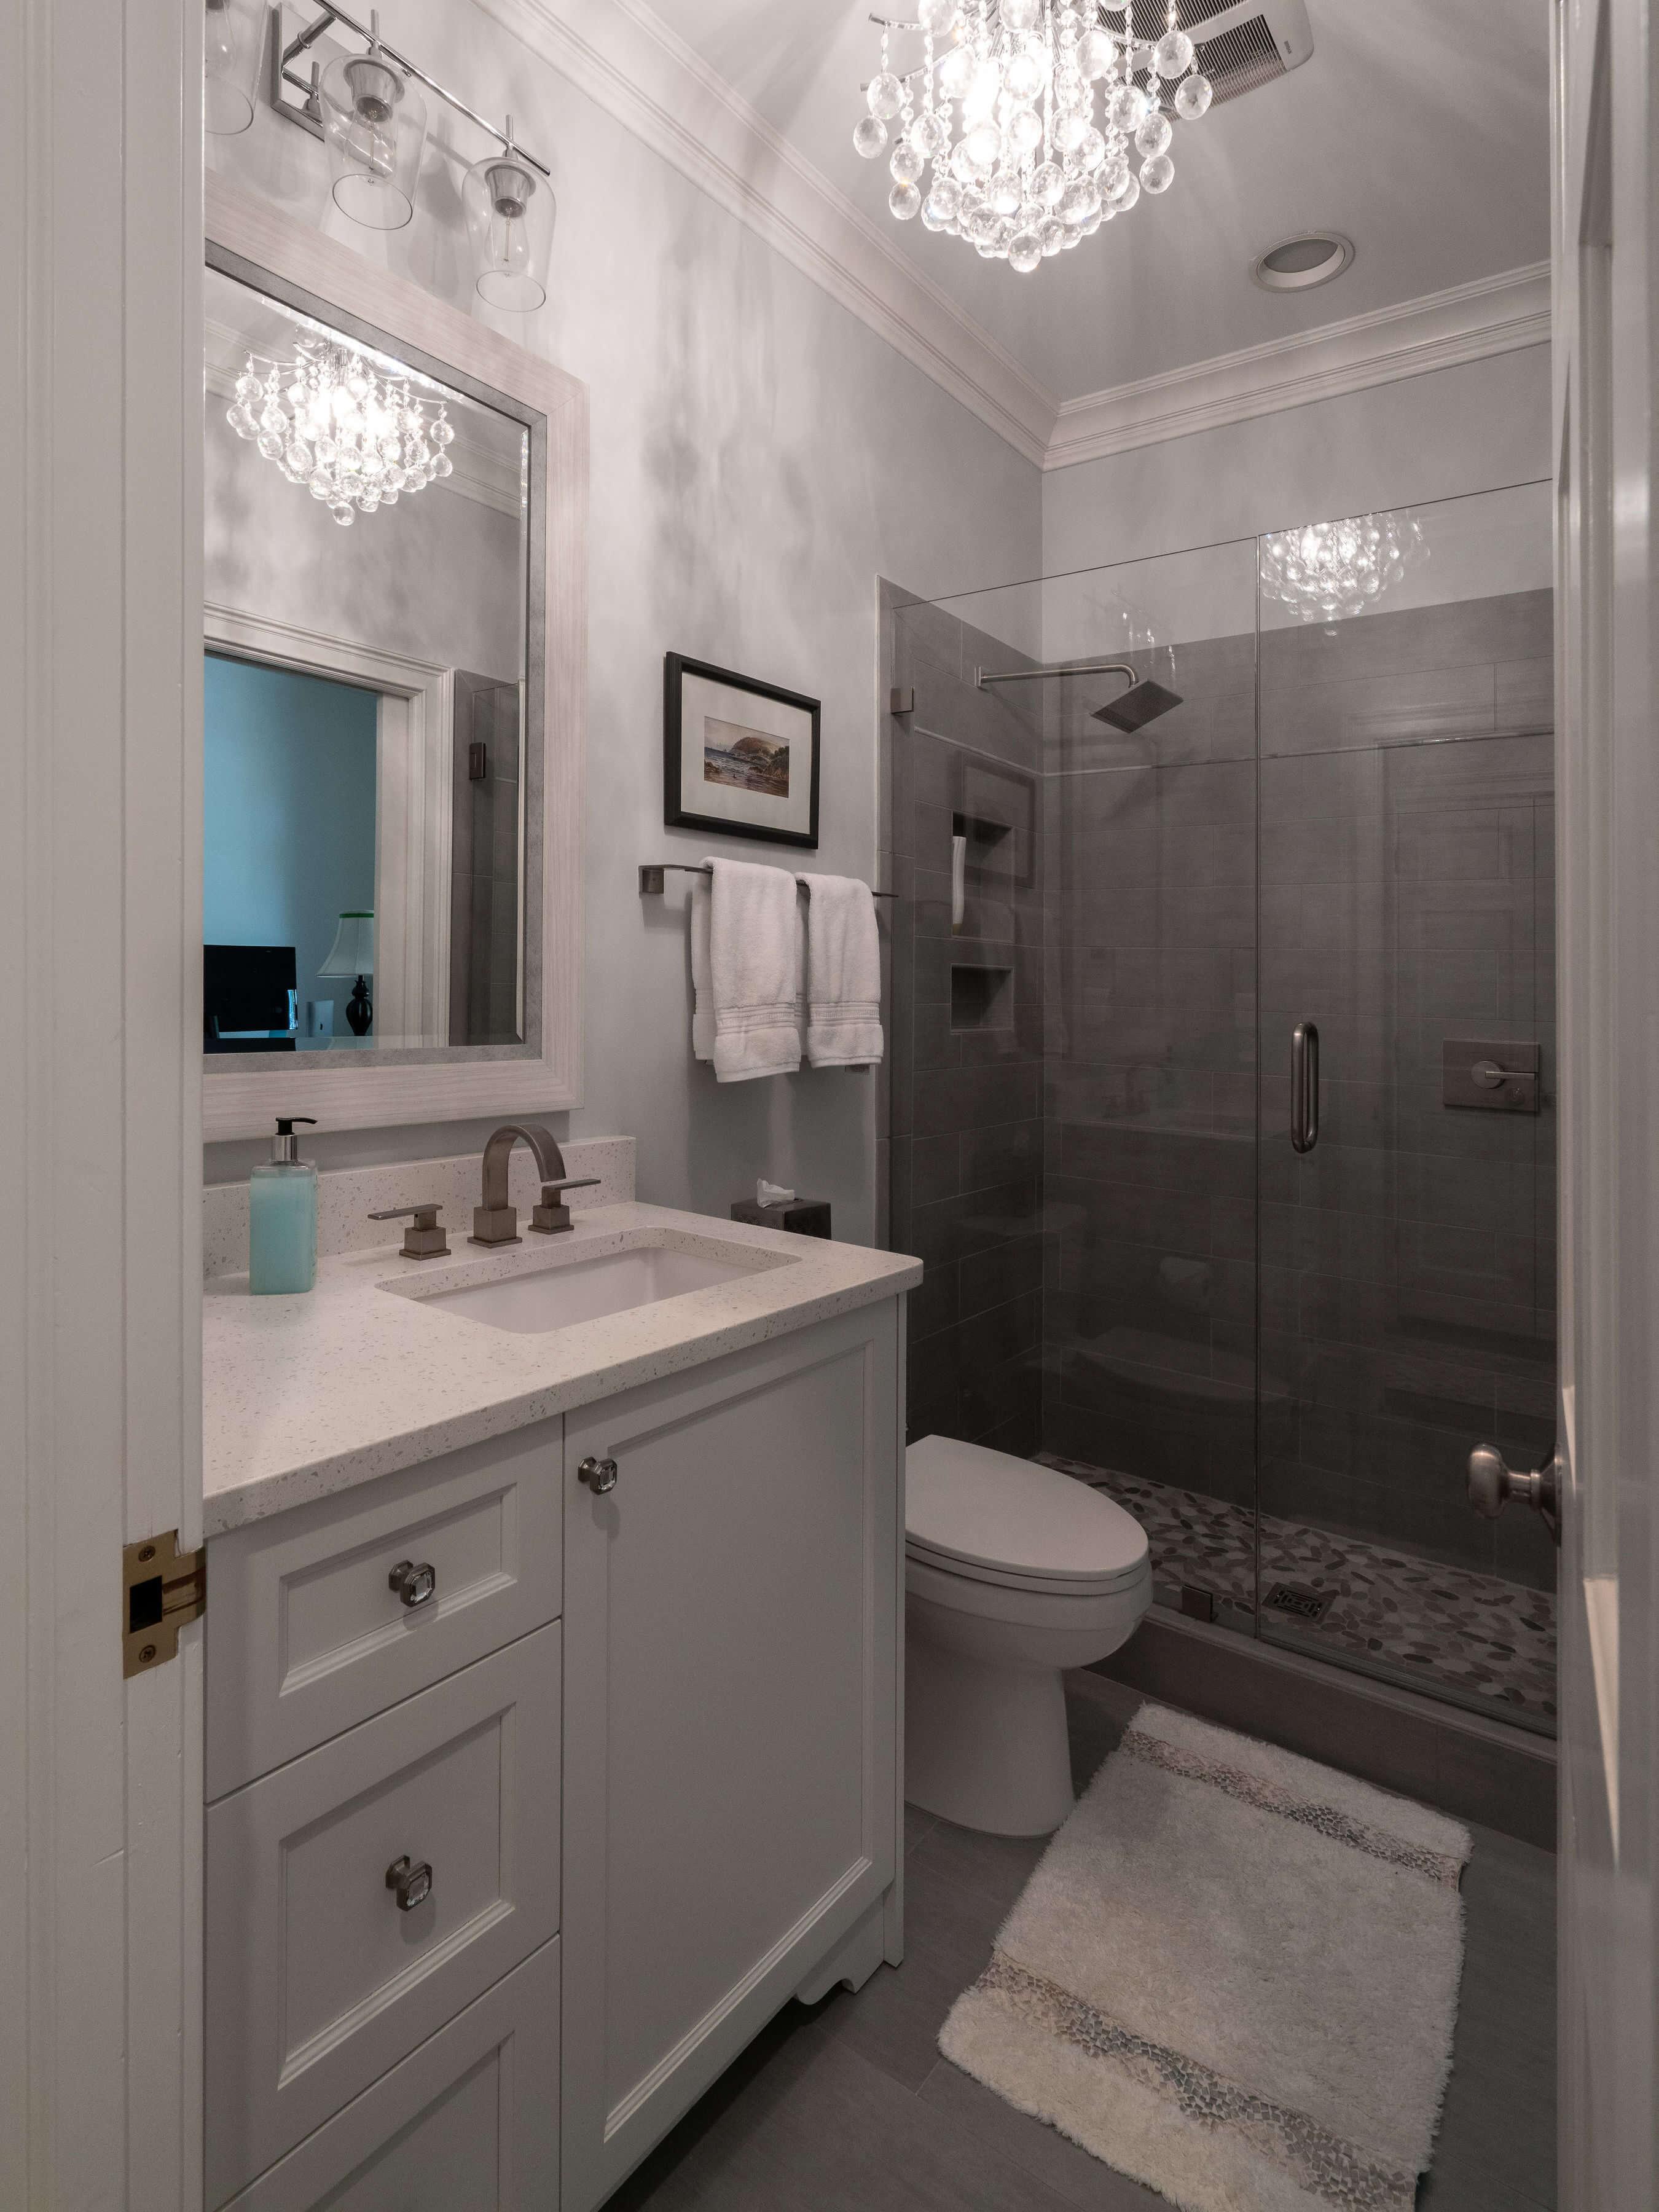 SouthPark Charlotte Bathroom Remodeling